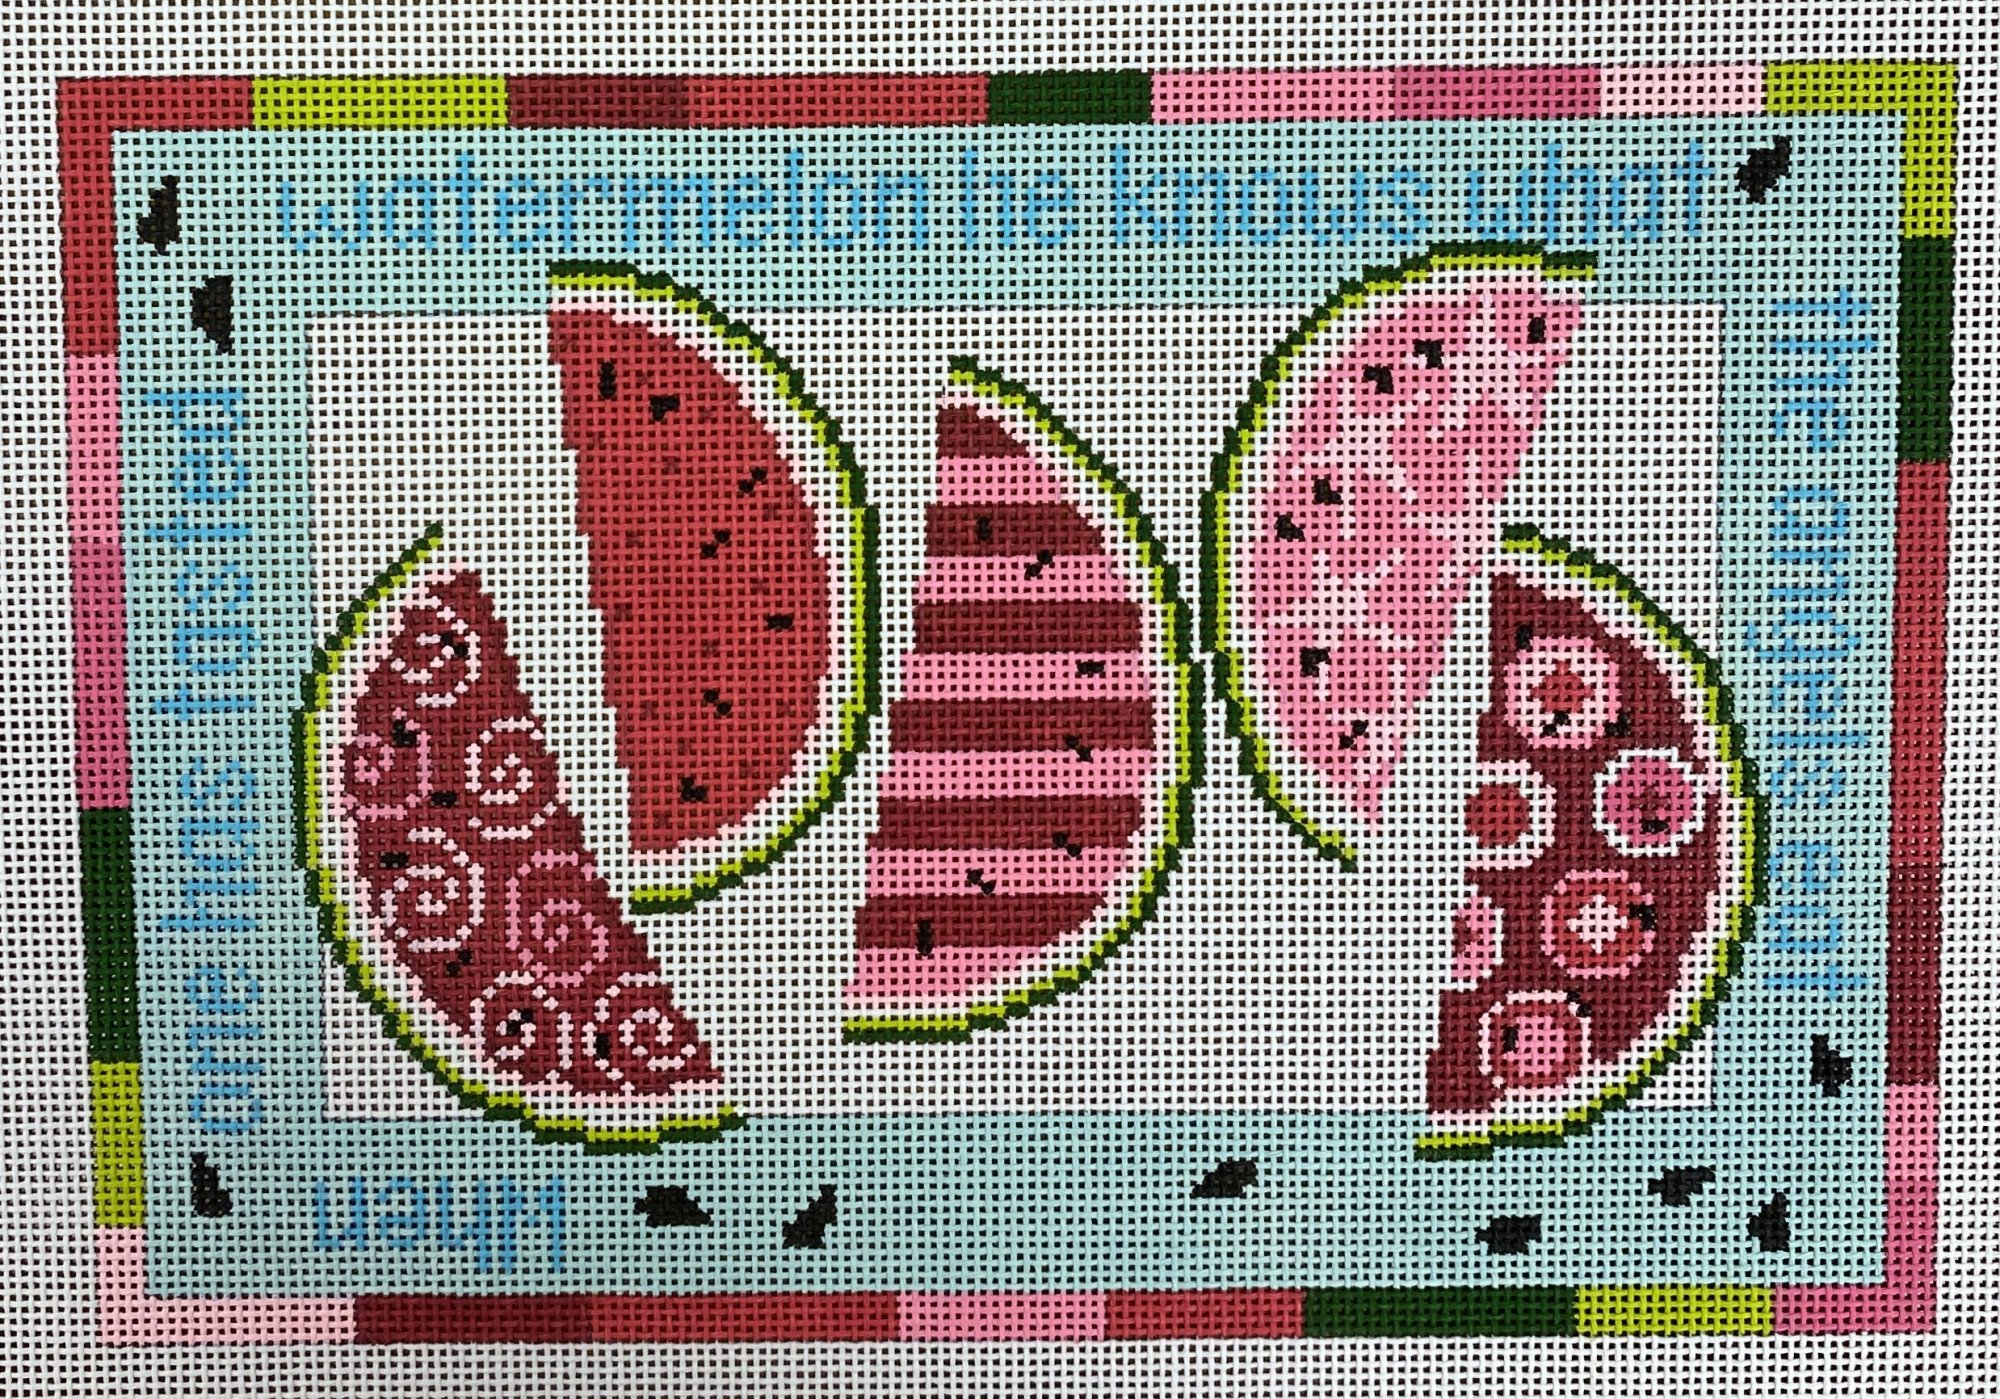 watermelon, fives